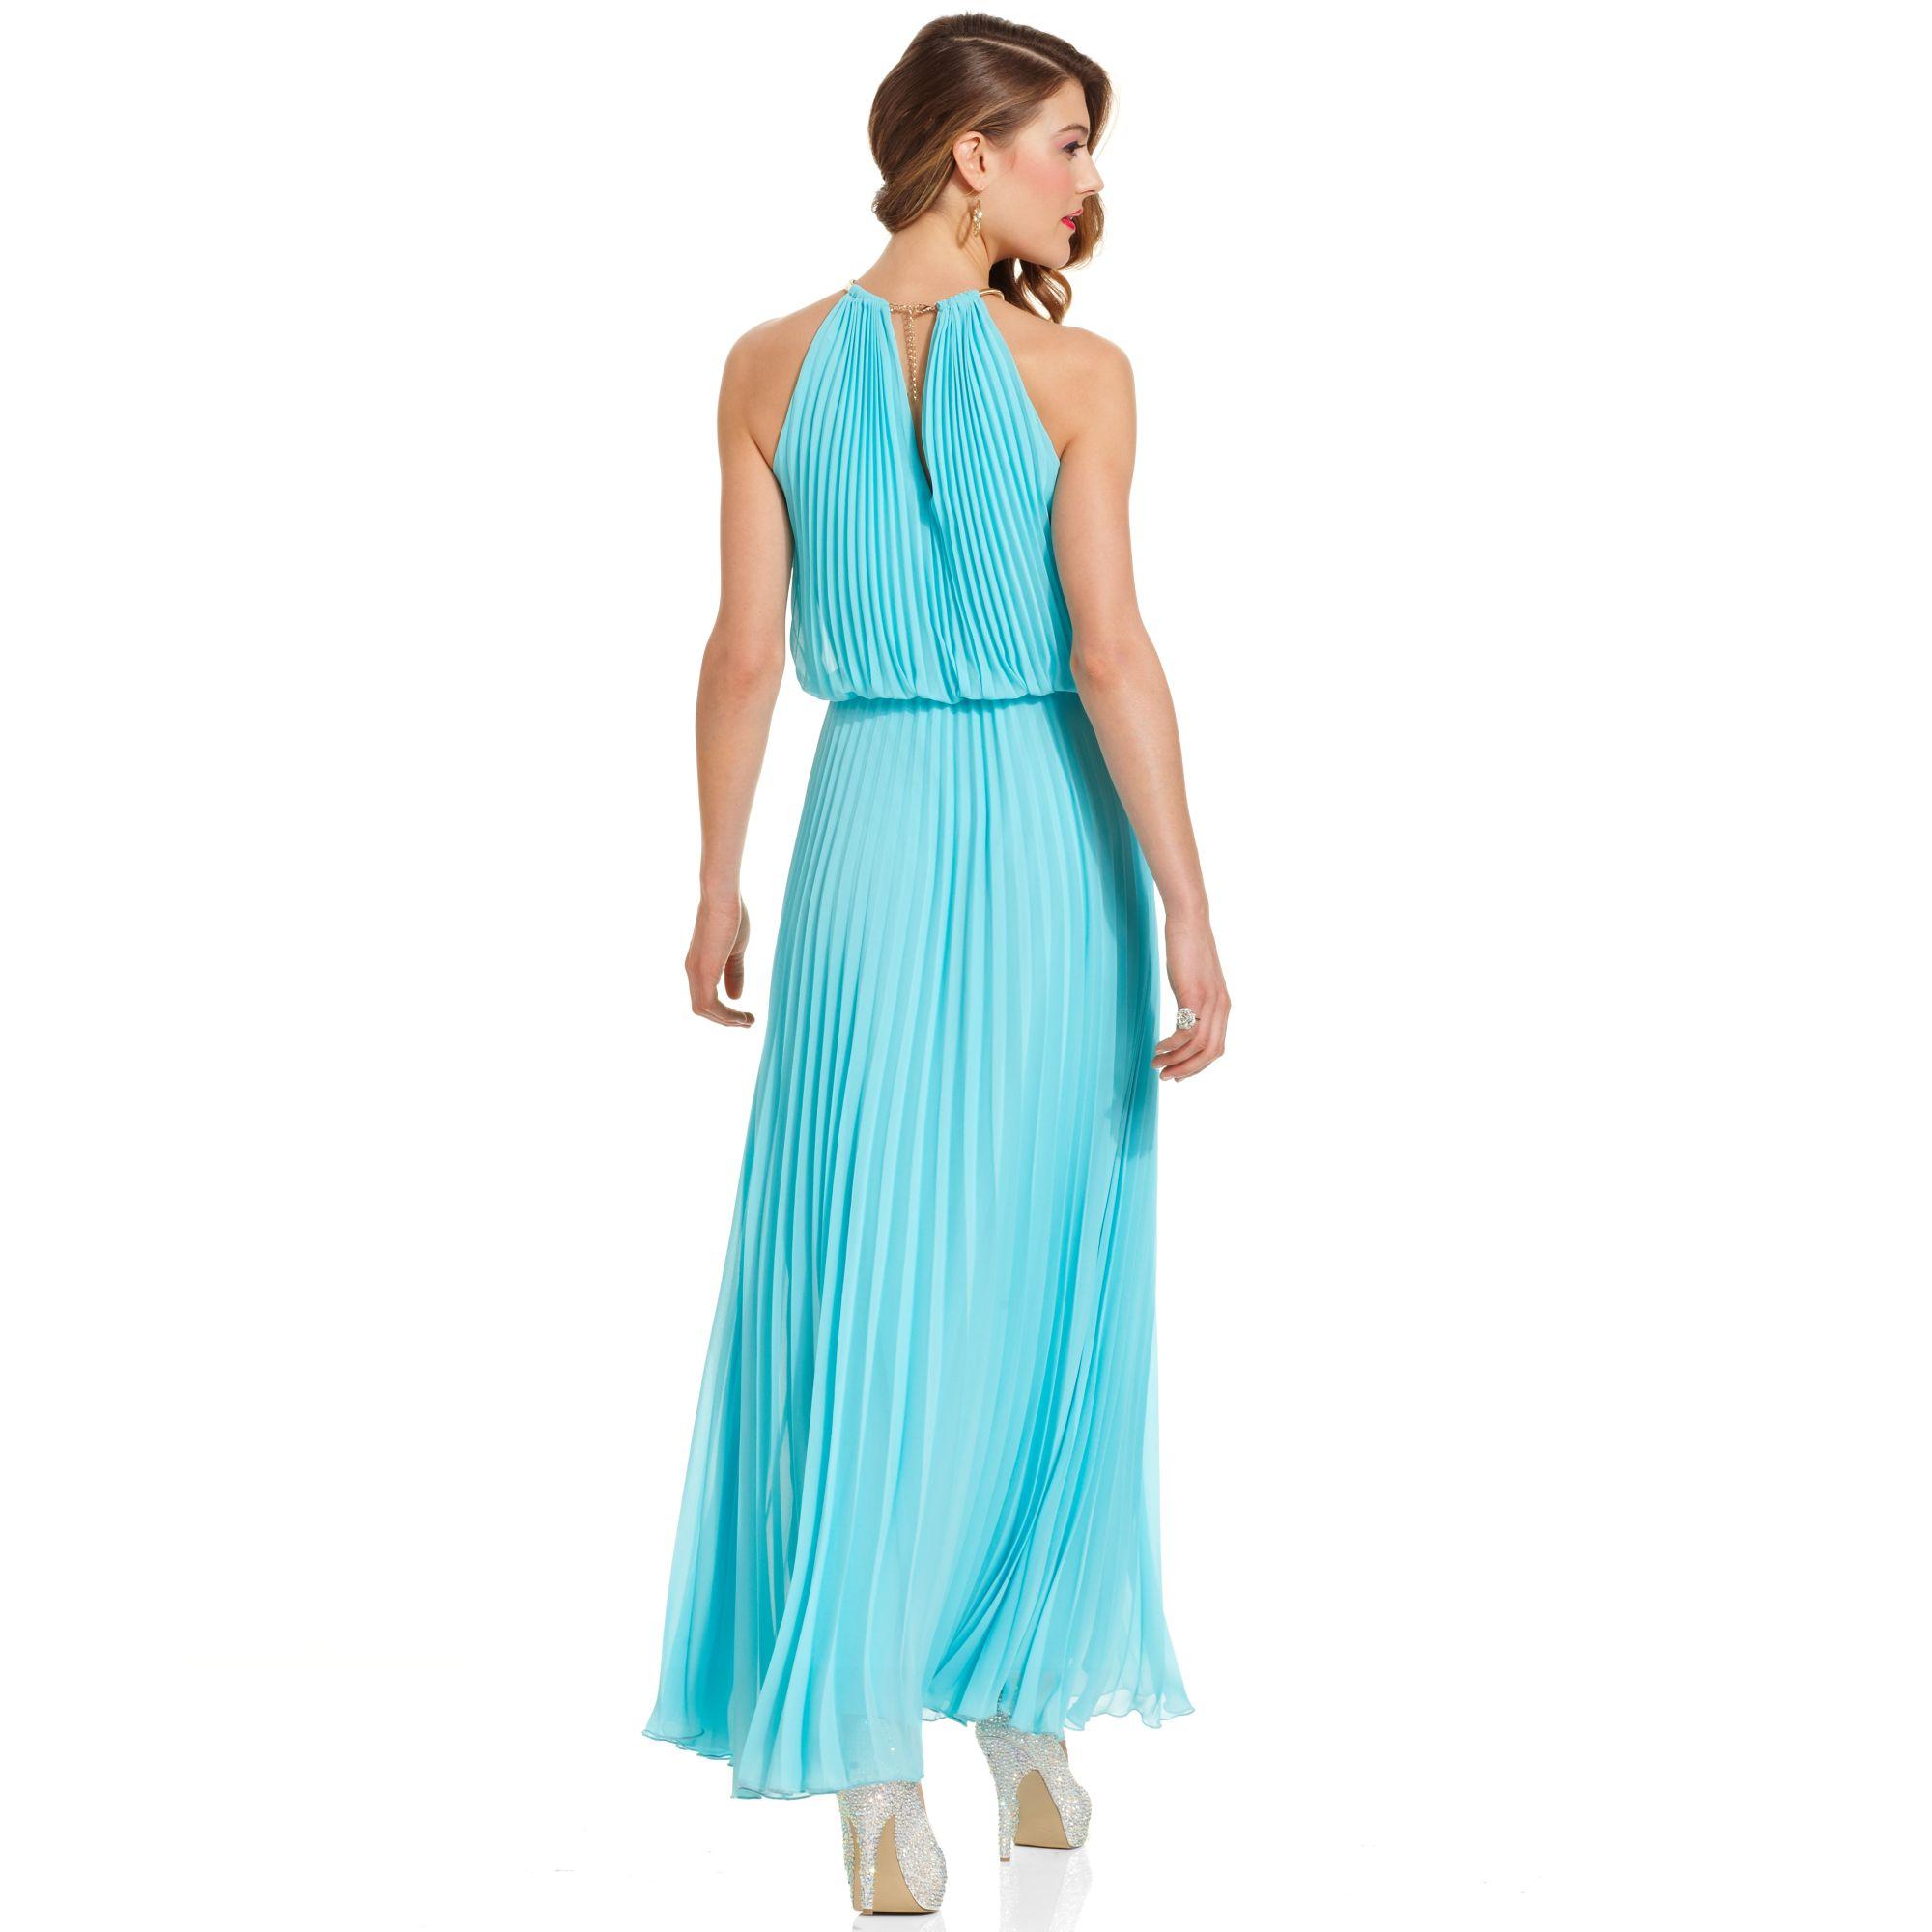 Lyst - Xscape Pleated Halter Blouson Gown in Blue